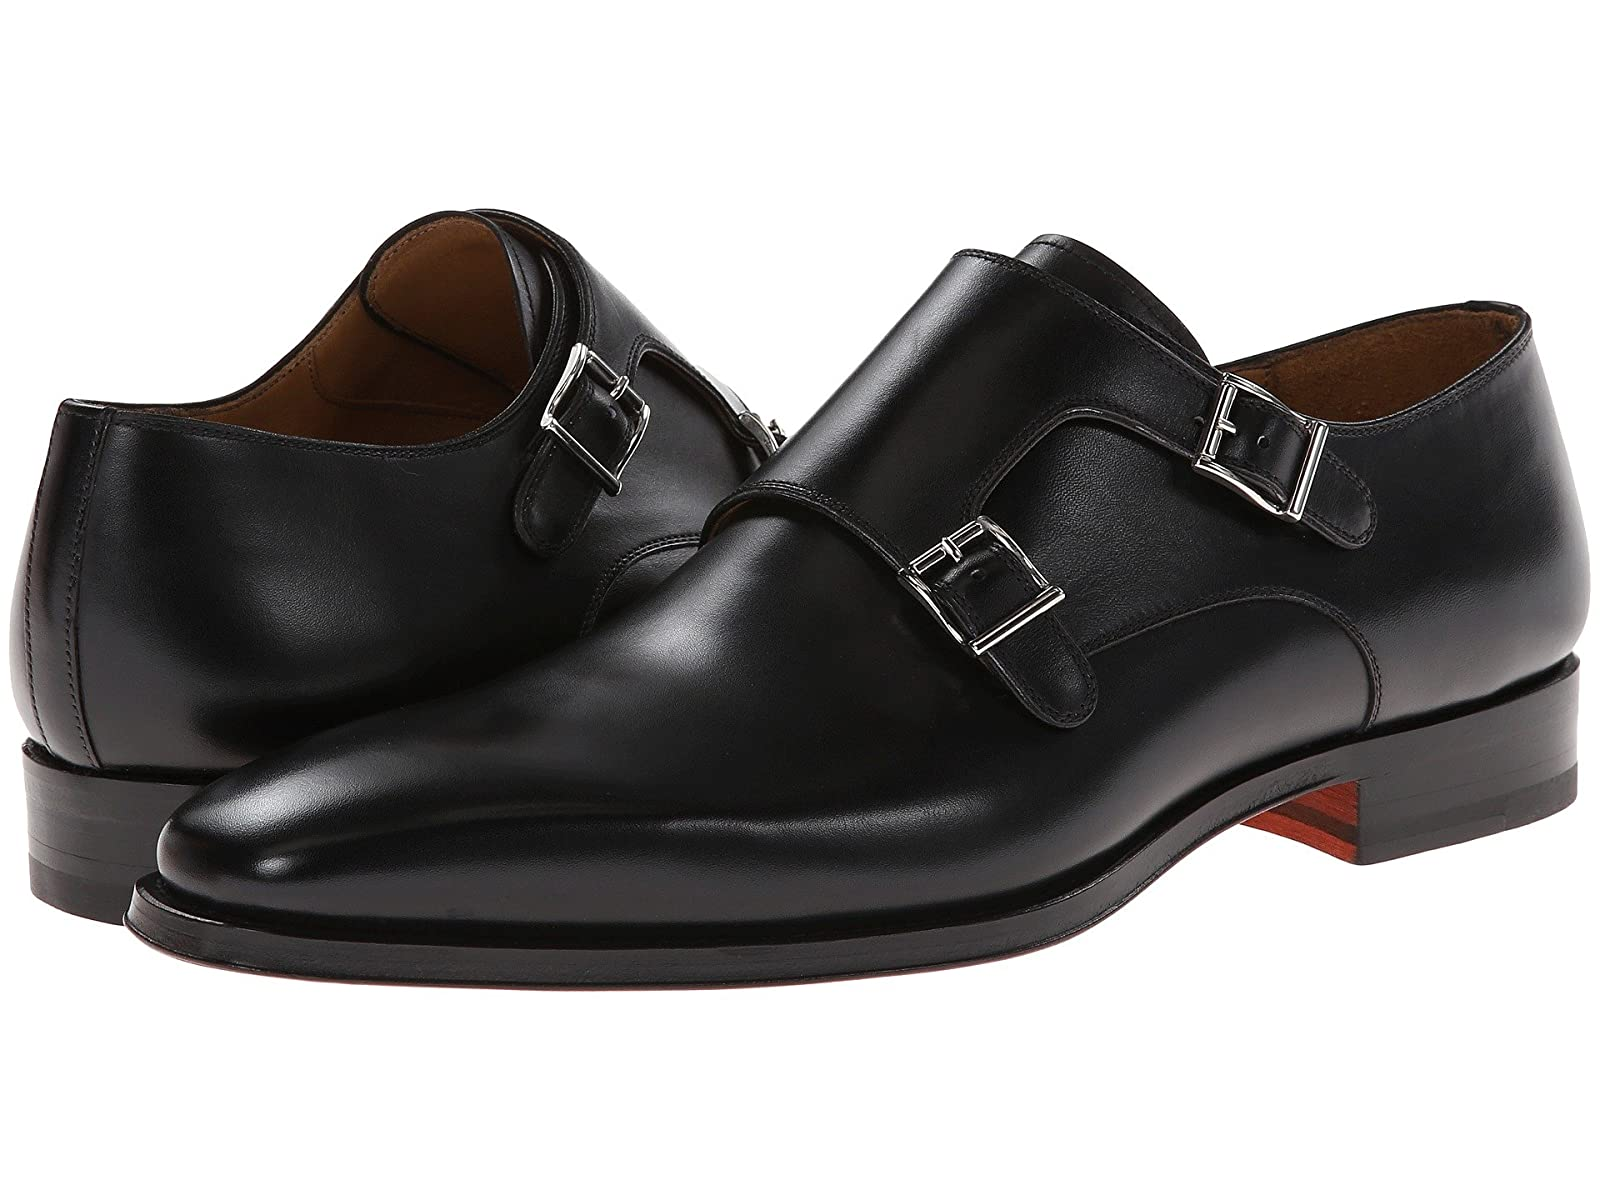 Magnanni MiroAtmospheric grades have affordable shoes